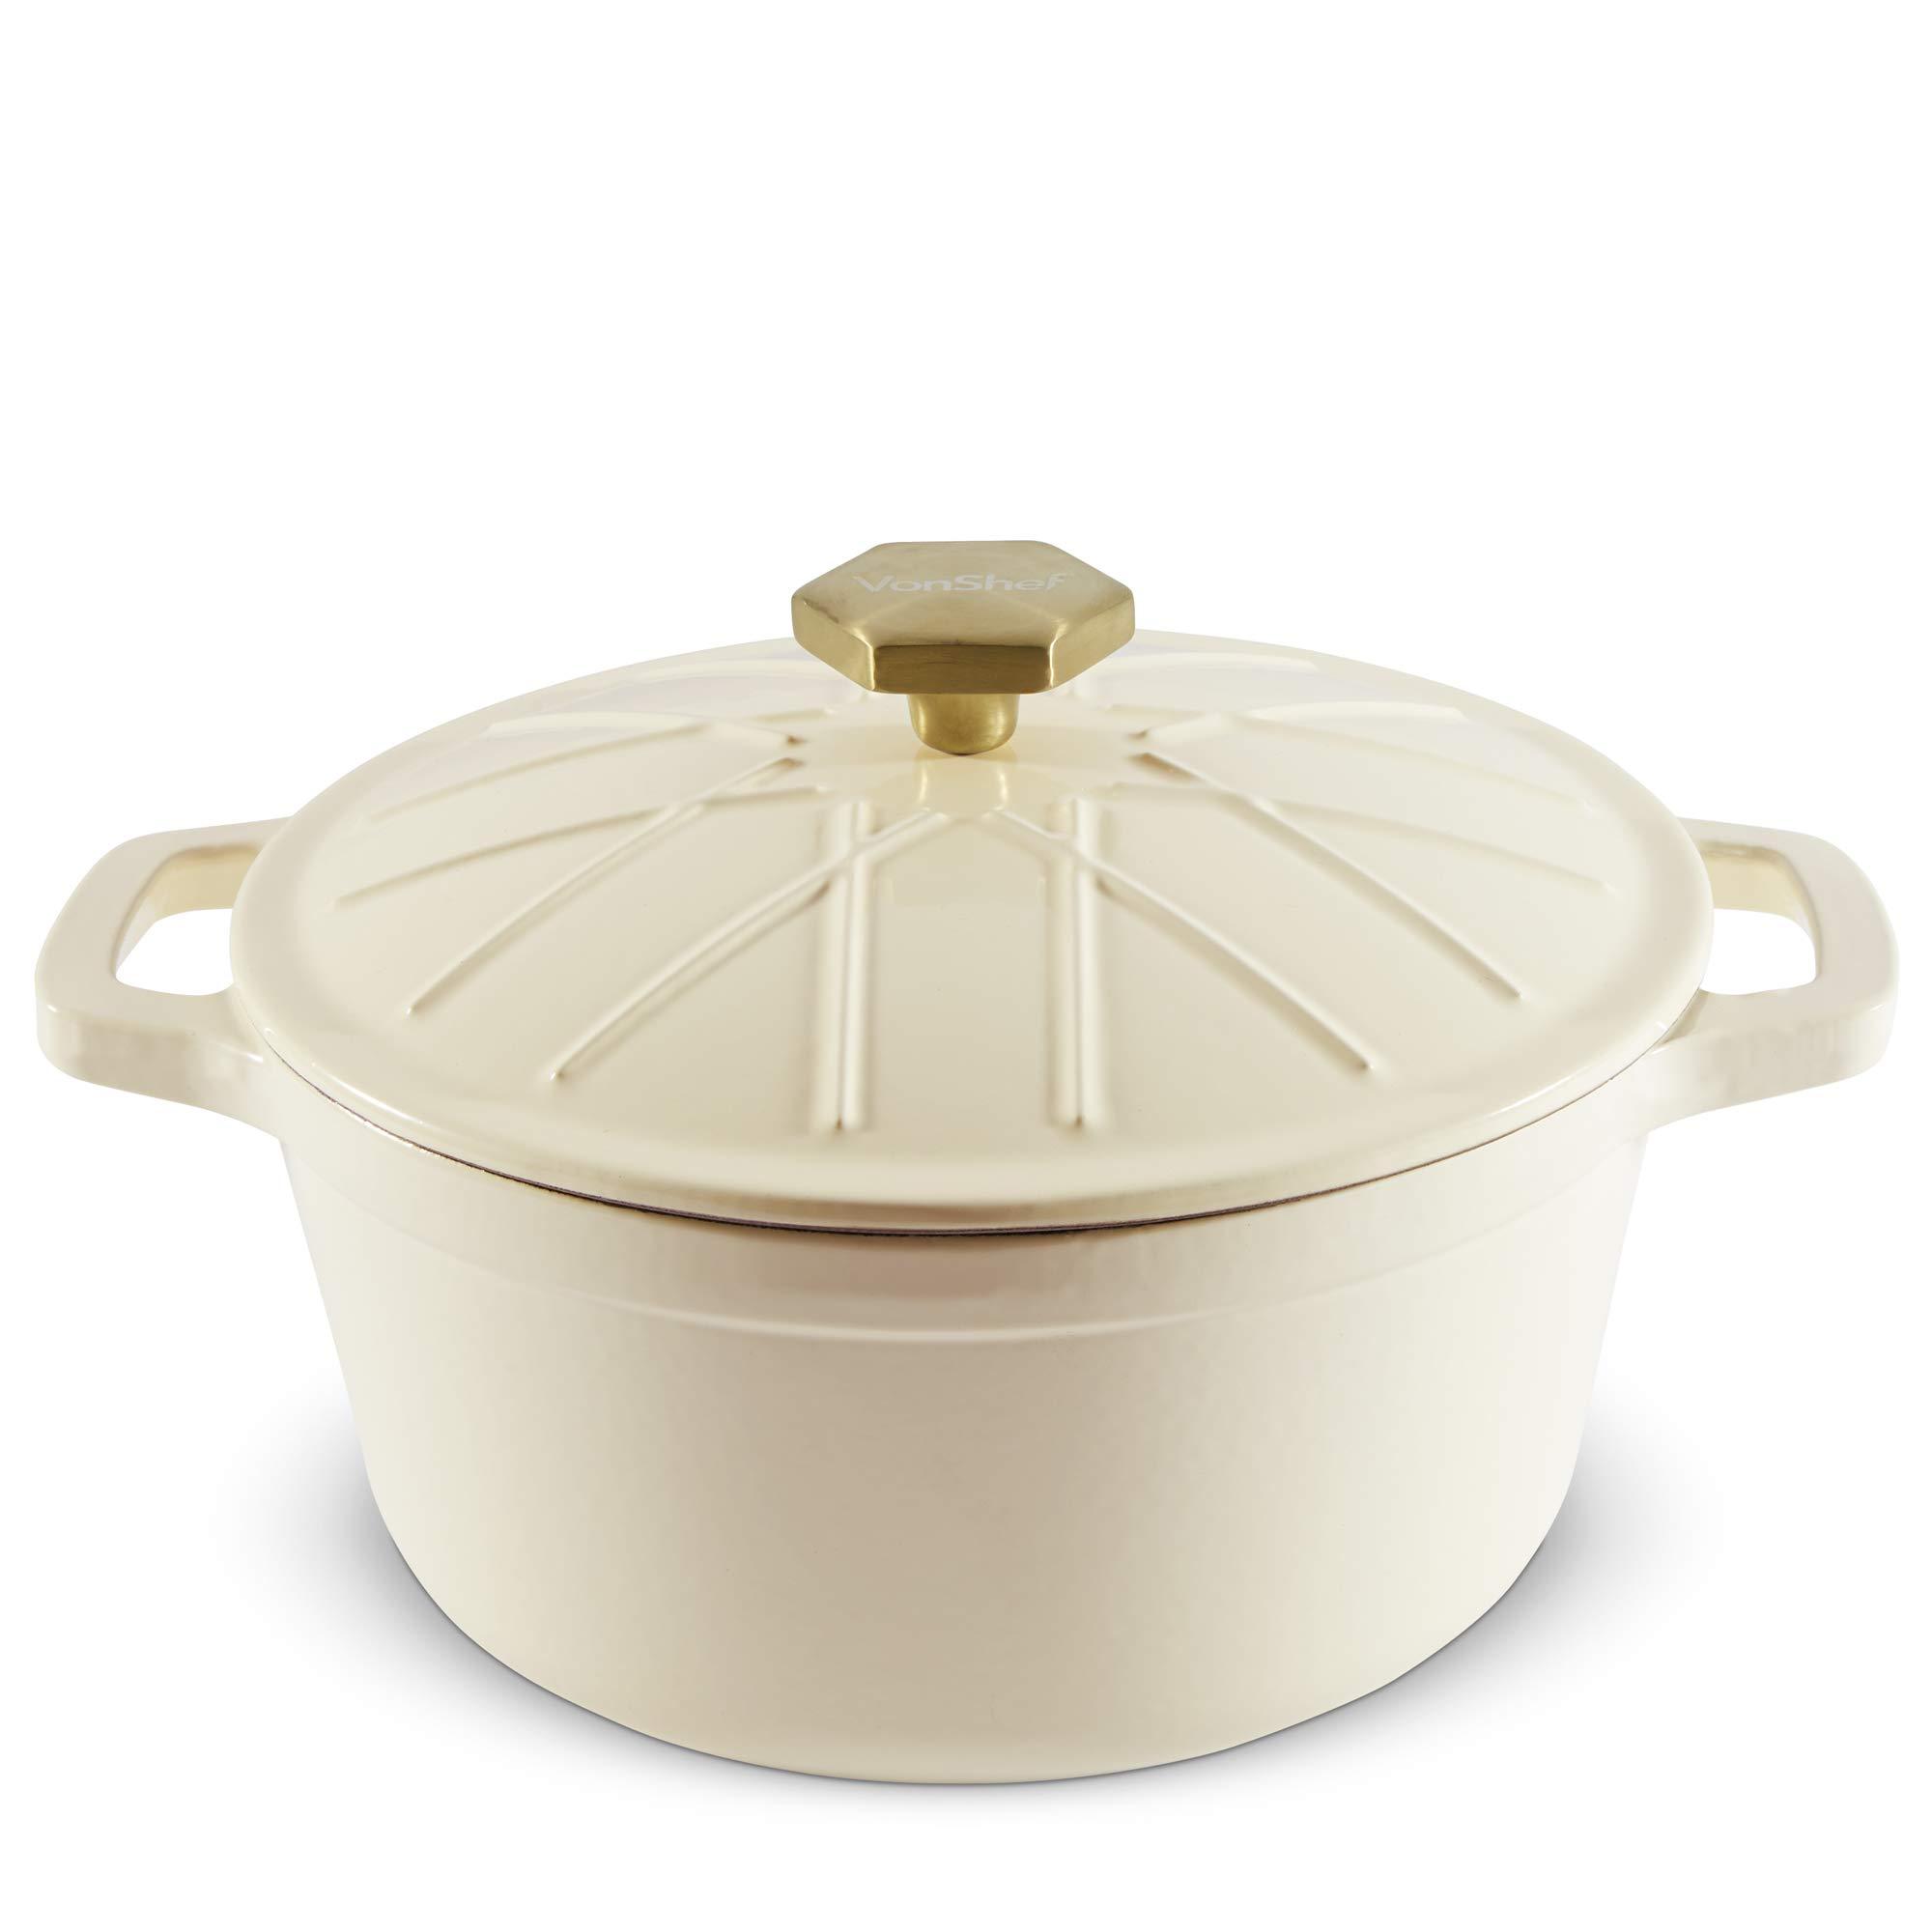 VonShef Cast Iron Round Dutch Oven Pot Casserole Dish, Naturally Non Stick Stain and Odor Resistant, Enamel Coated Cream, 11.5 Inch Diameter, 6.3 Quarts